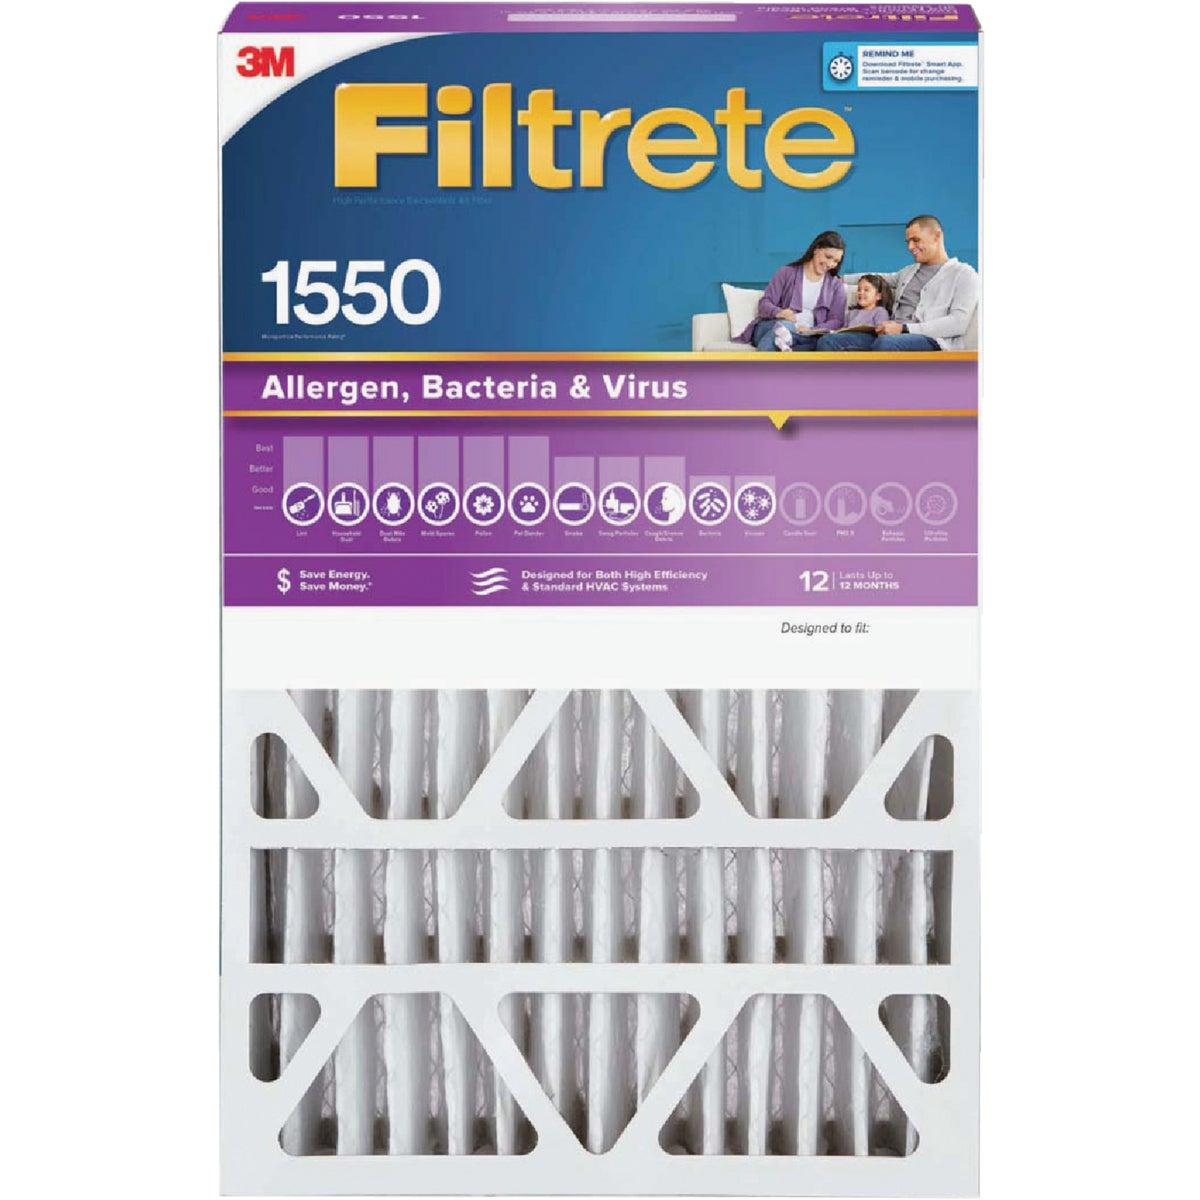 3M Filtrete 20 In. x 25 In. x 4 In. Allergen, Bacteria & Virus 1550 MPR Deep Pleat Furnace Filter